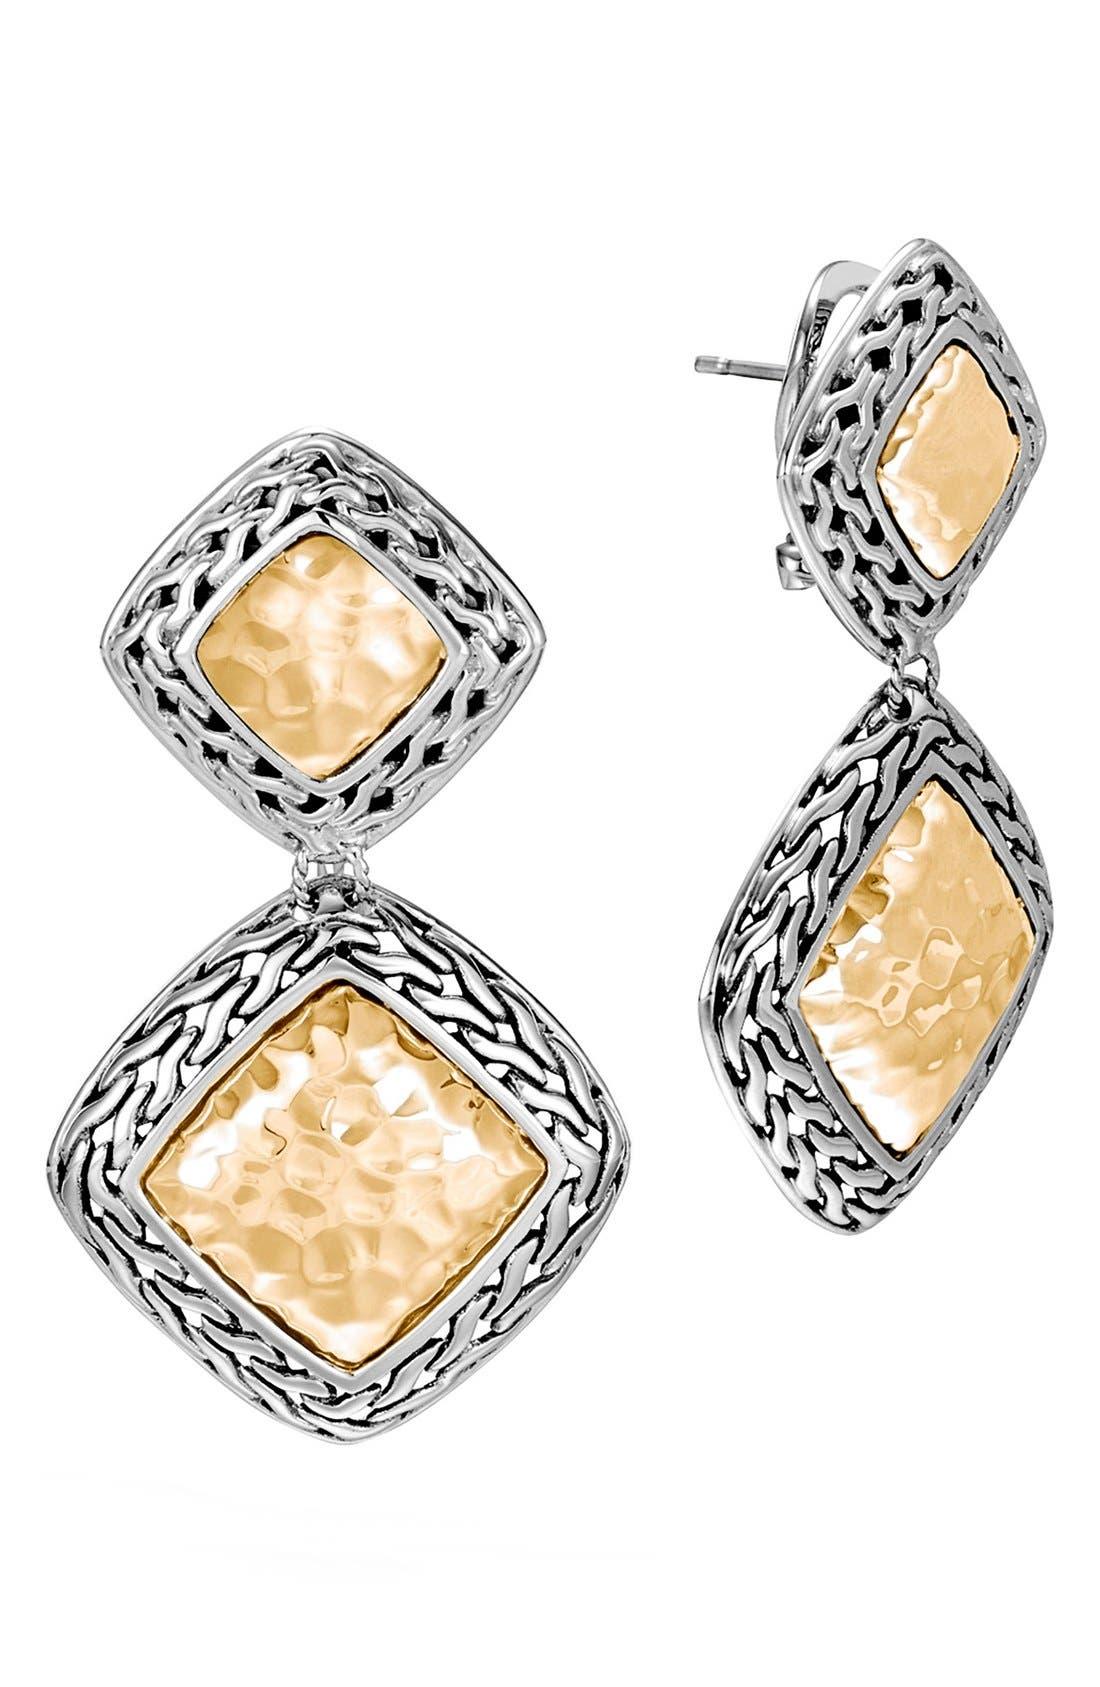 Heritage Drop Earrings,                             Main thumbnail 1, color,                             040